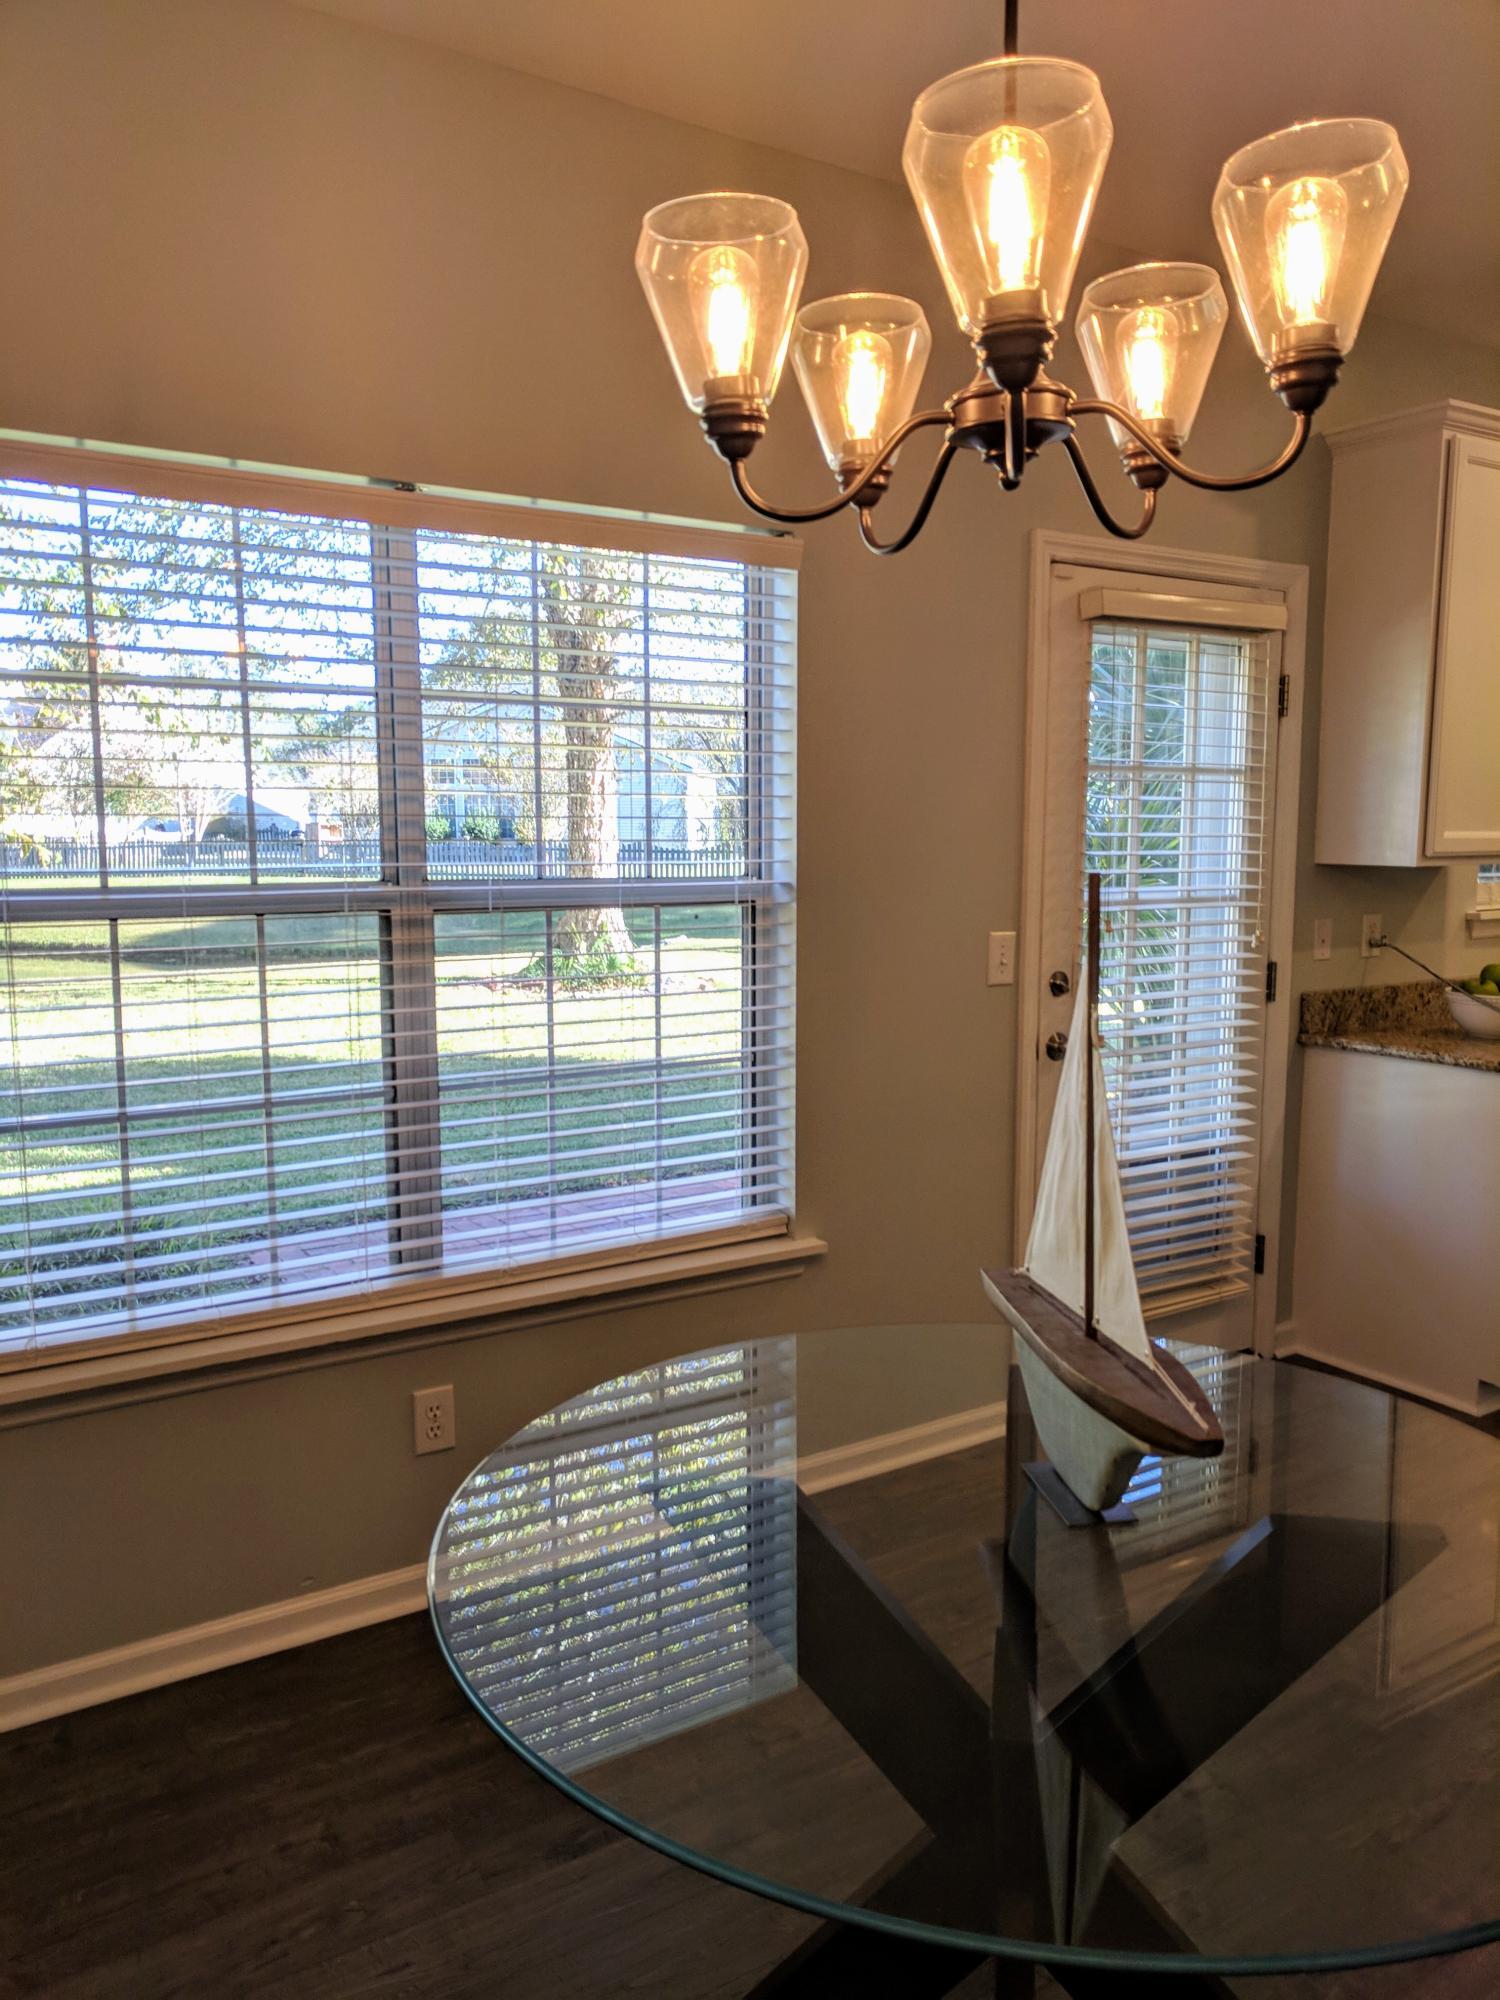 Dunes West Homes For Sale - 1309 Sassafrass, Mount Pleasant, SC - 16